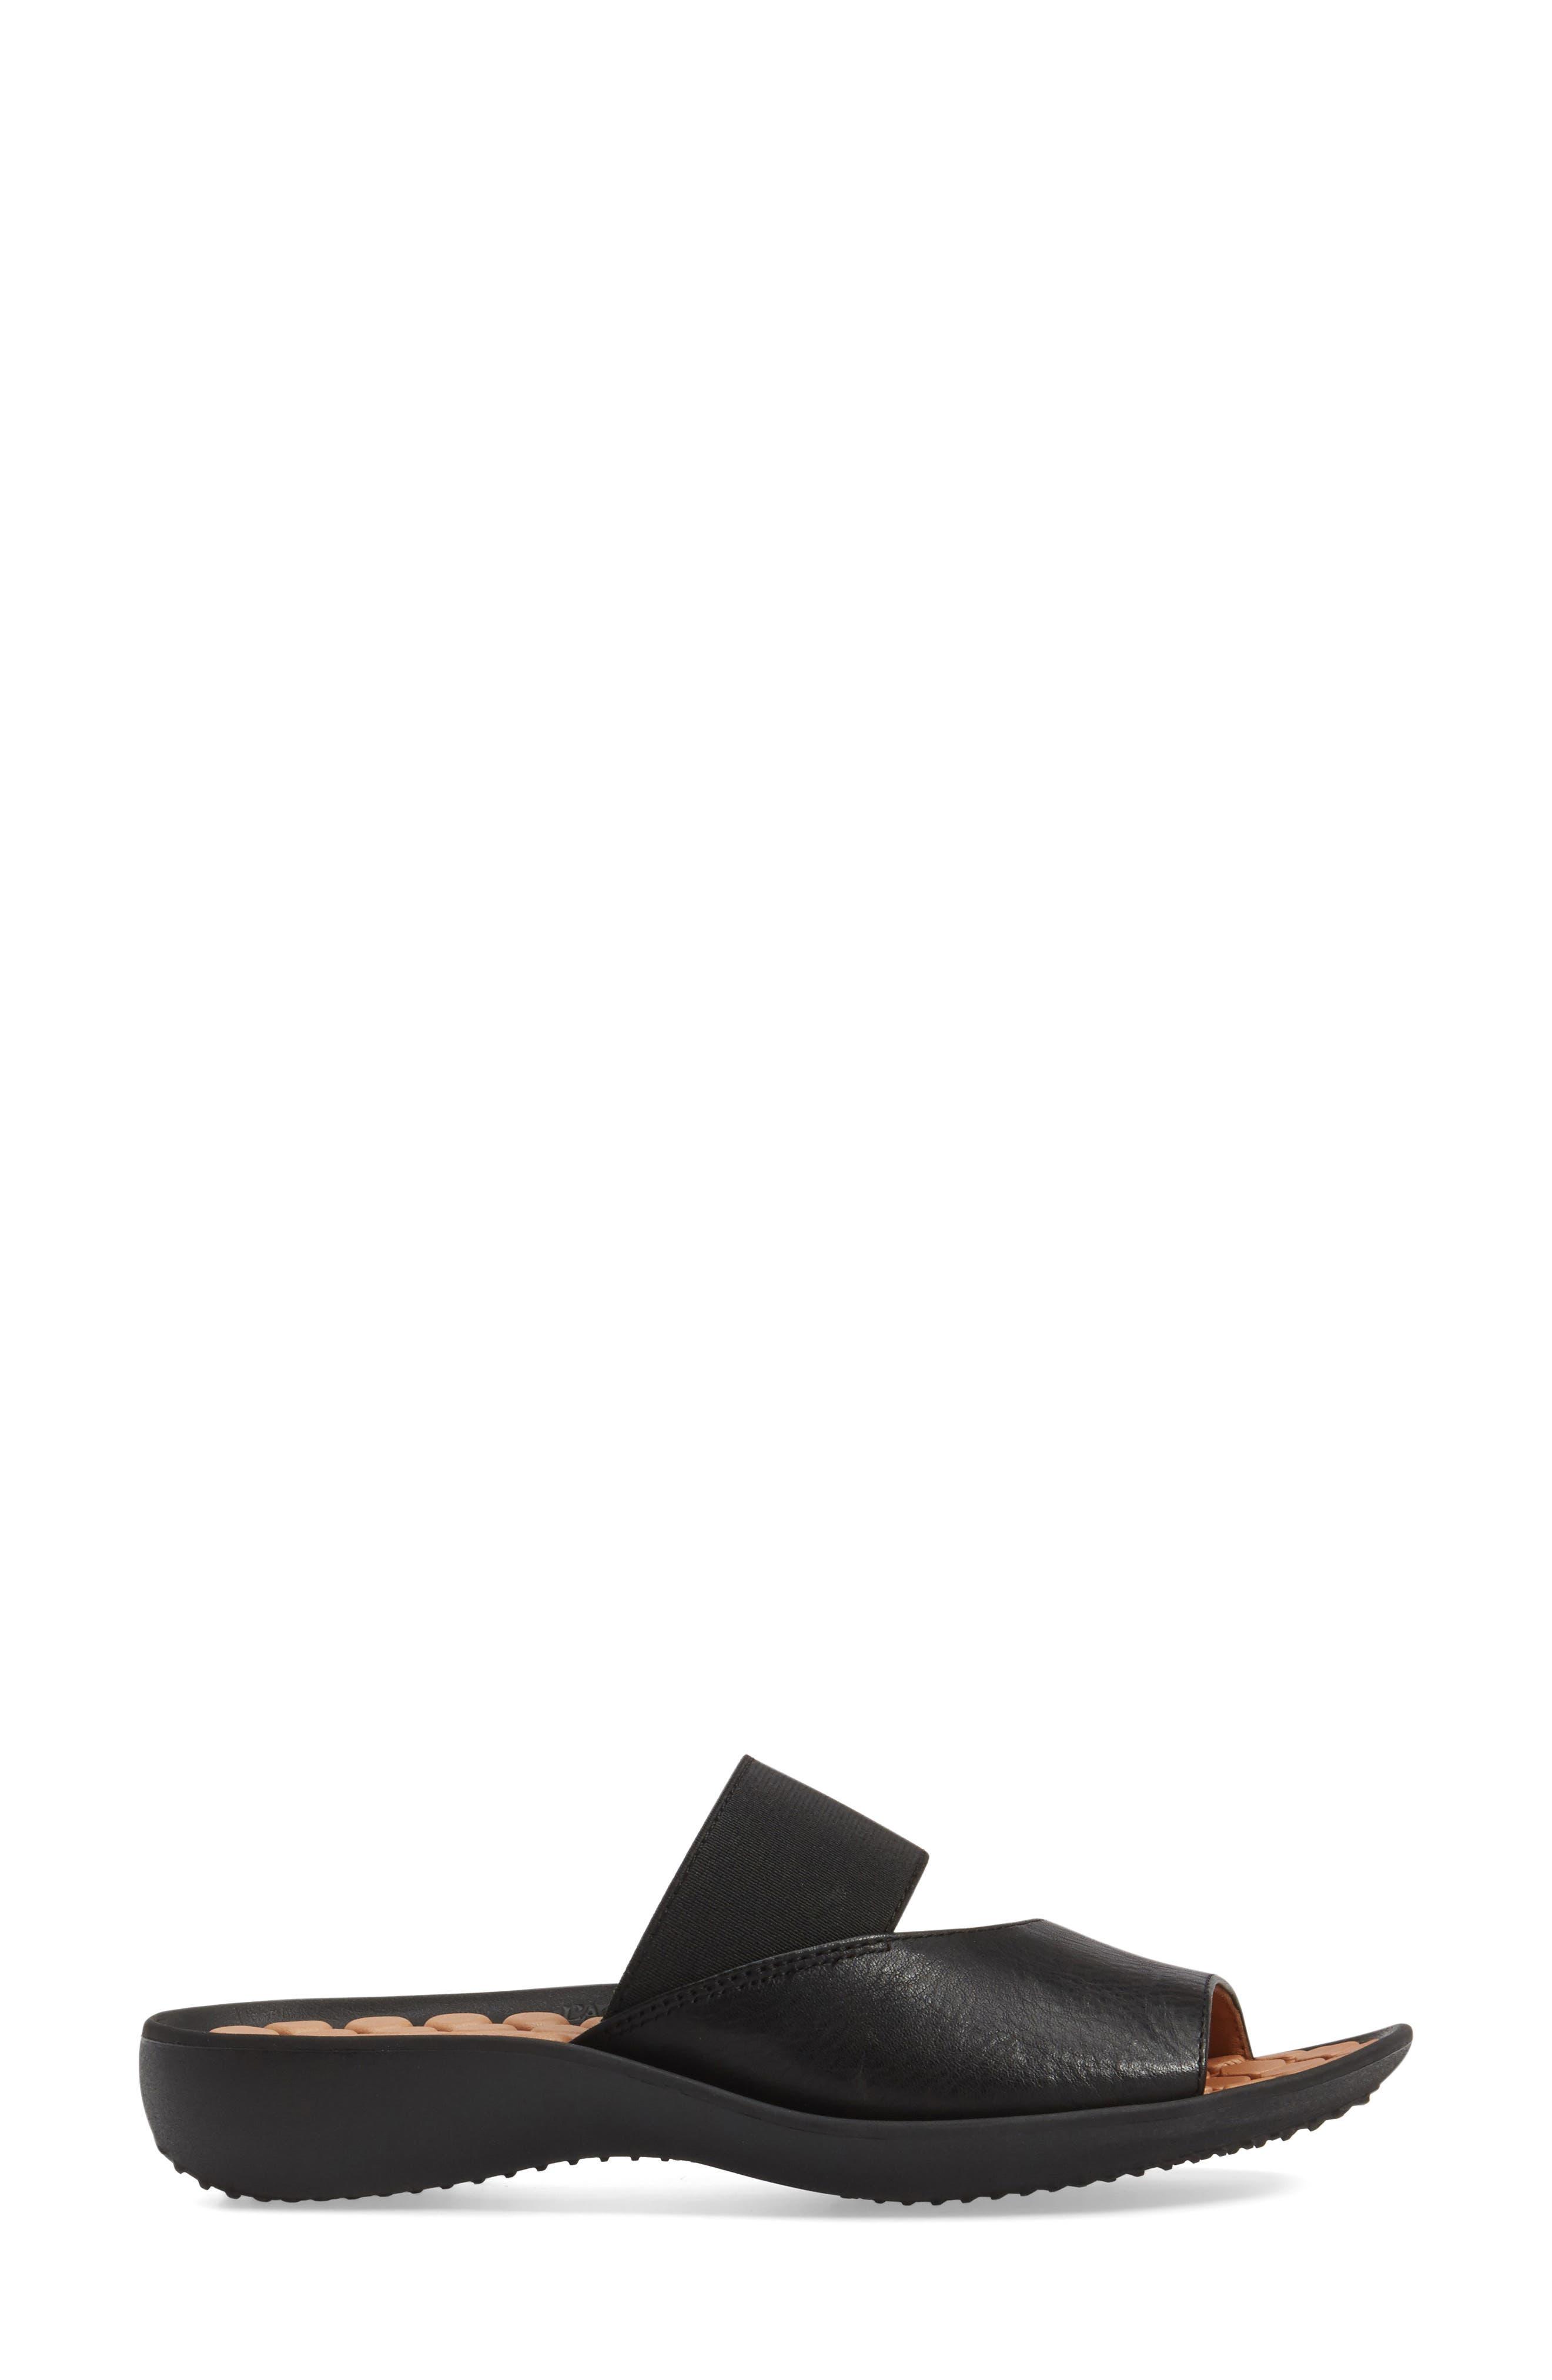 Northville Slide Sandal,                             Alternate thumbnail 3, color,                             BLACK LEATHER